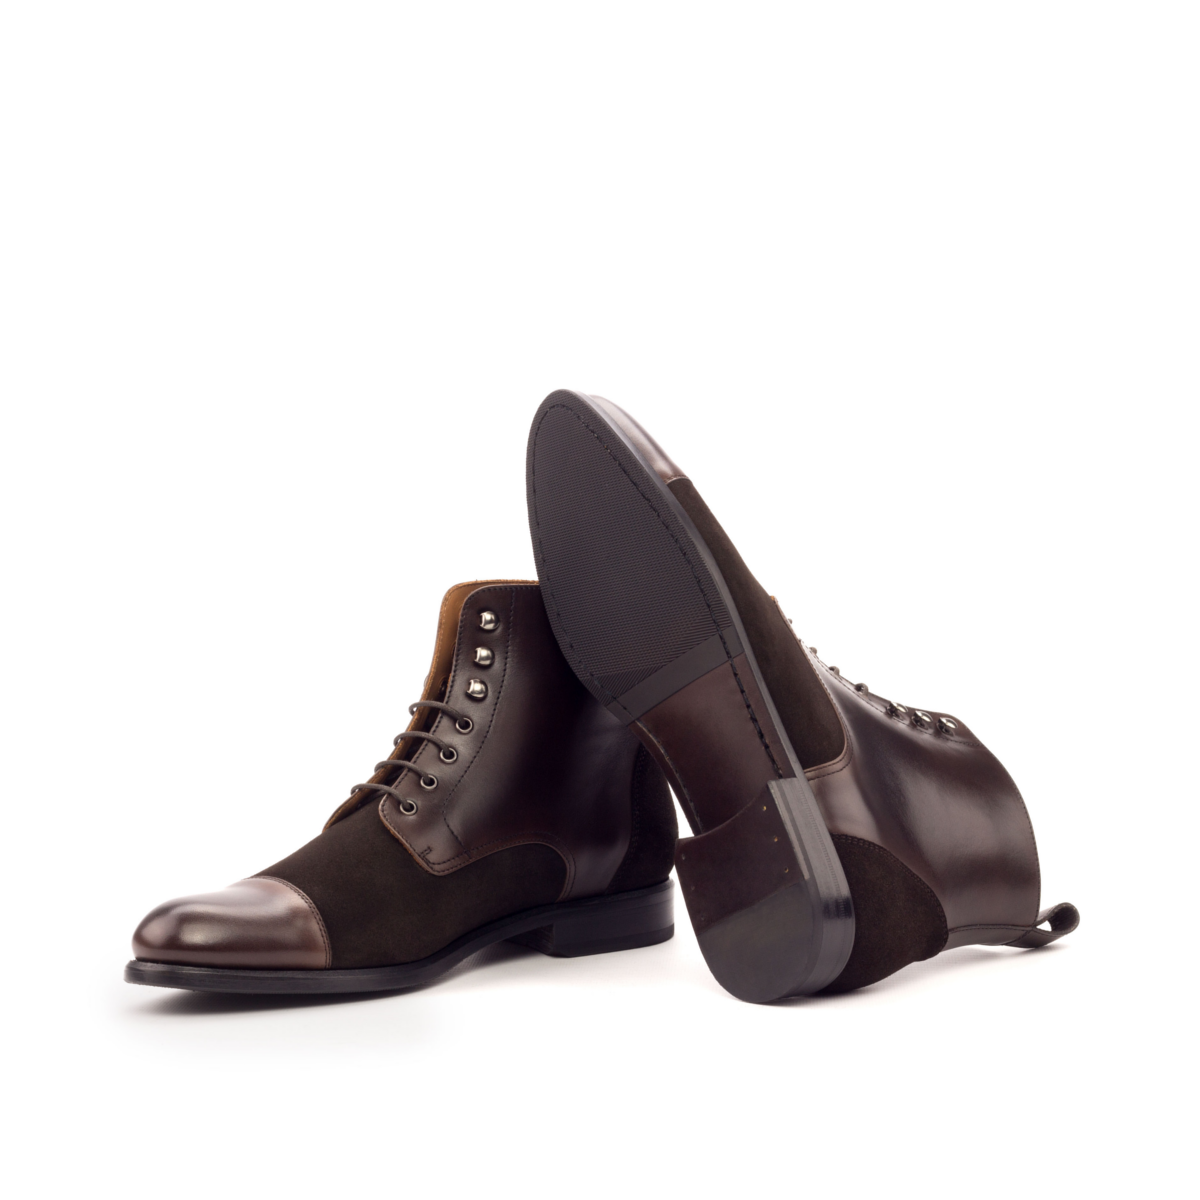 Women Lace Up Captoe Boot - Painted Calf Dark Brown-Lux Suede Dark Brown-